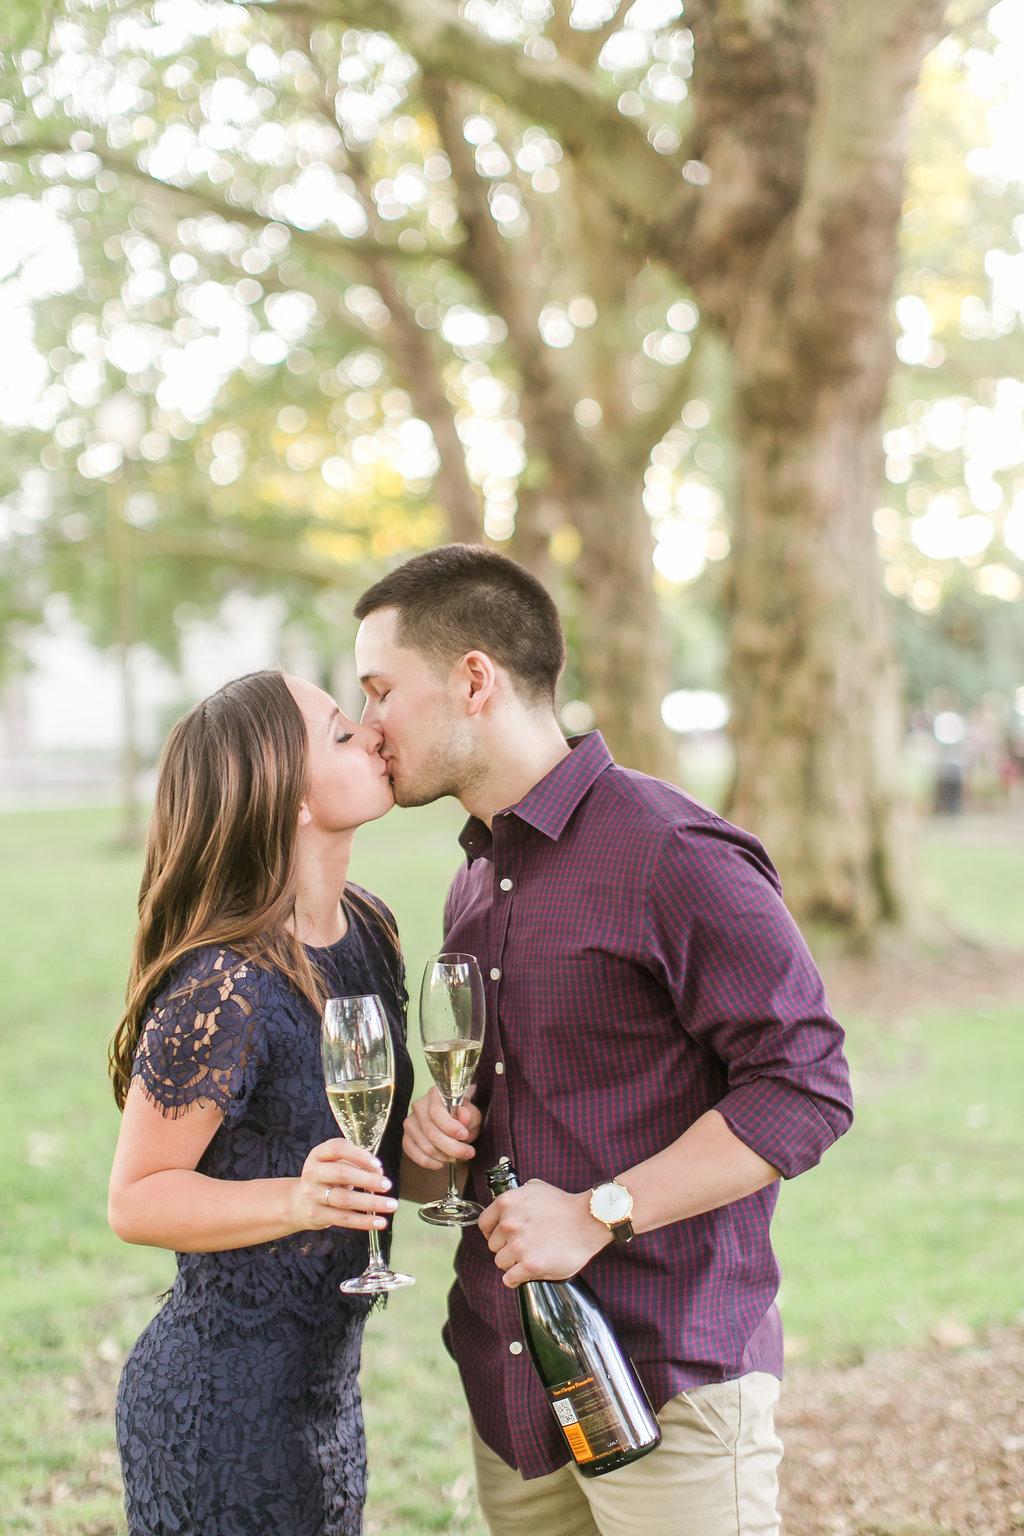 Seattle Engagement Session at Greenlake | Wedding Wise Seattle Planning | Lloyd Photographers